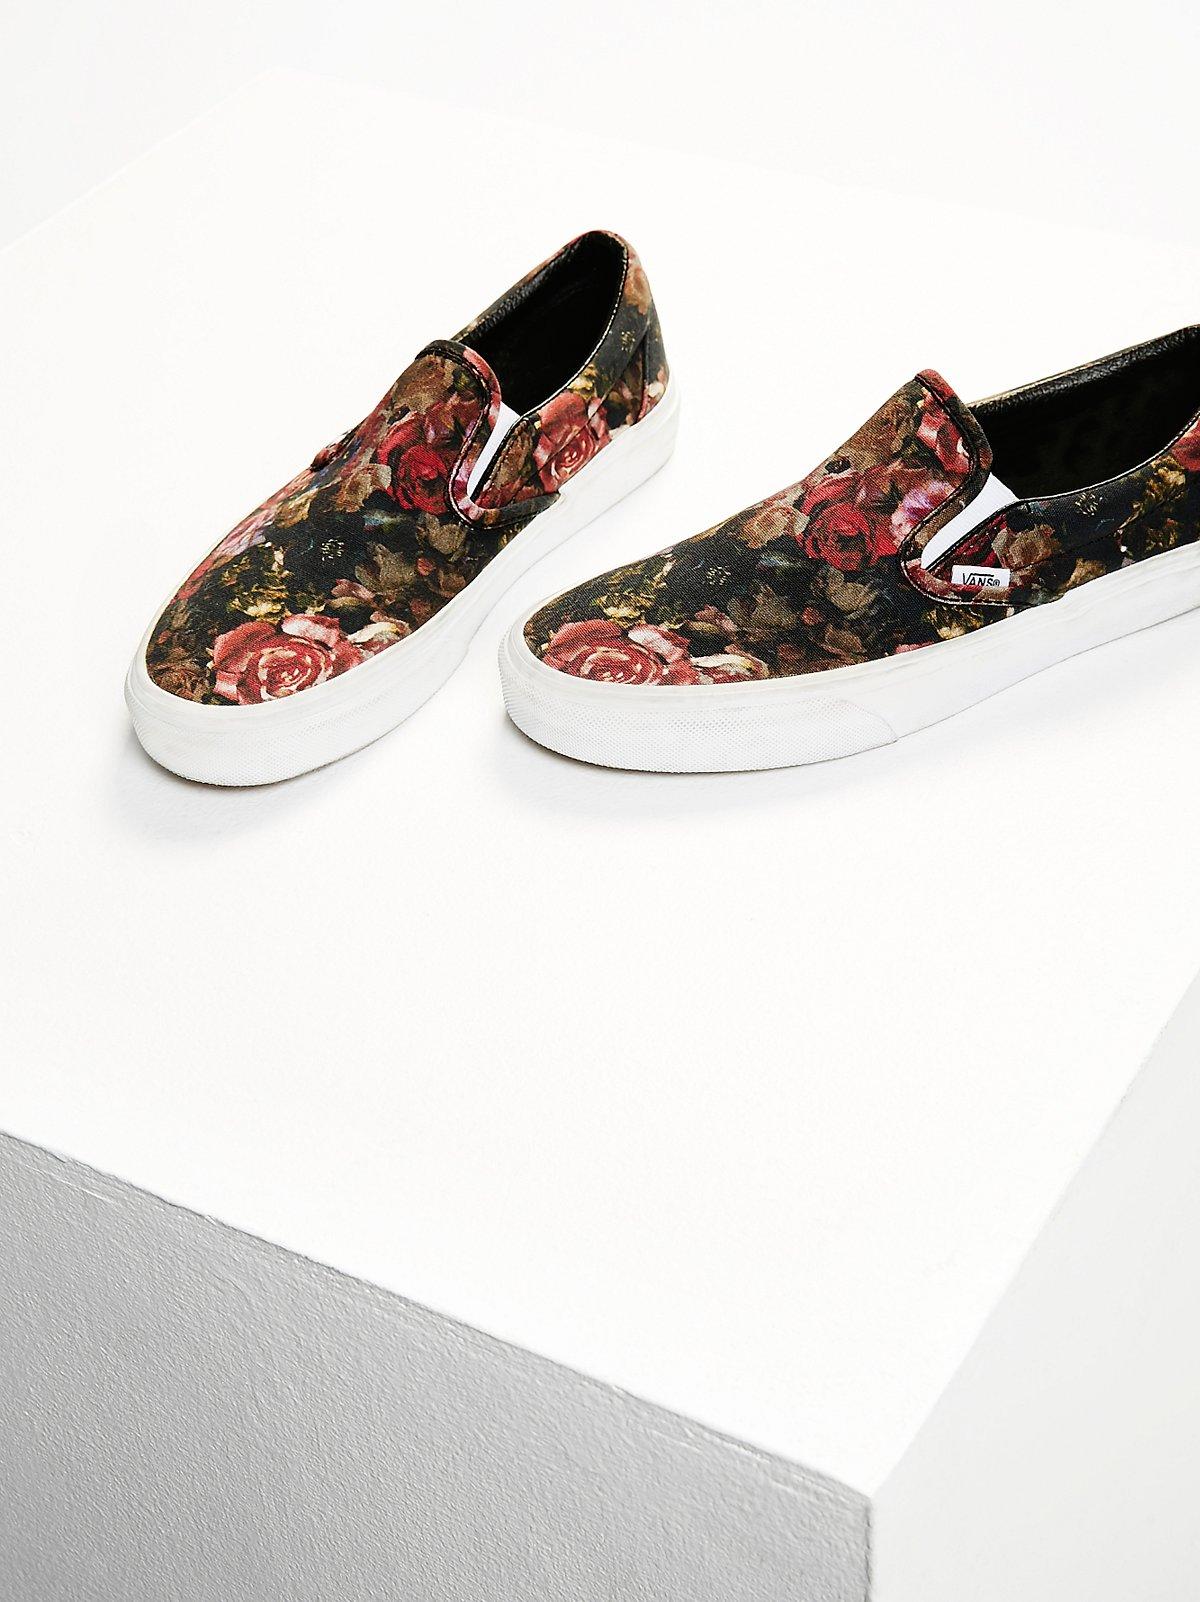 Moody印花套穿式运动鞋